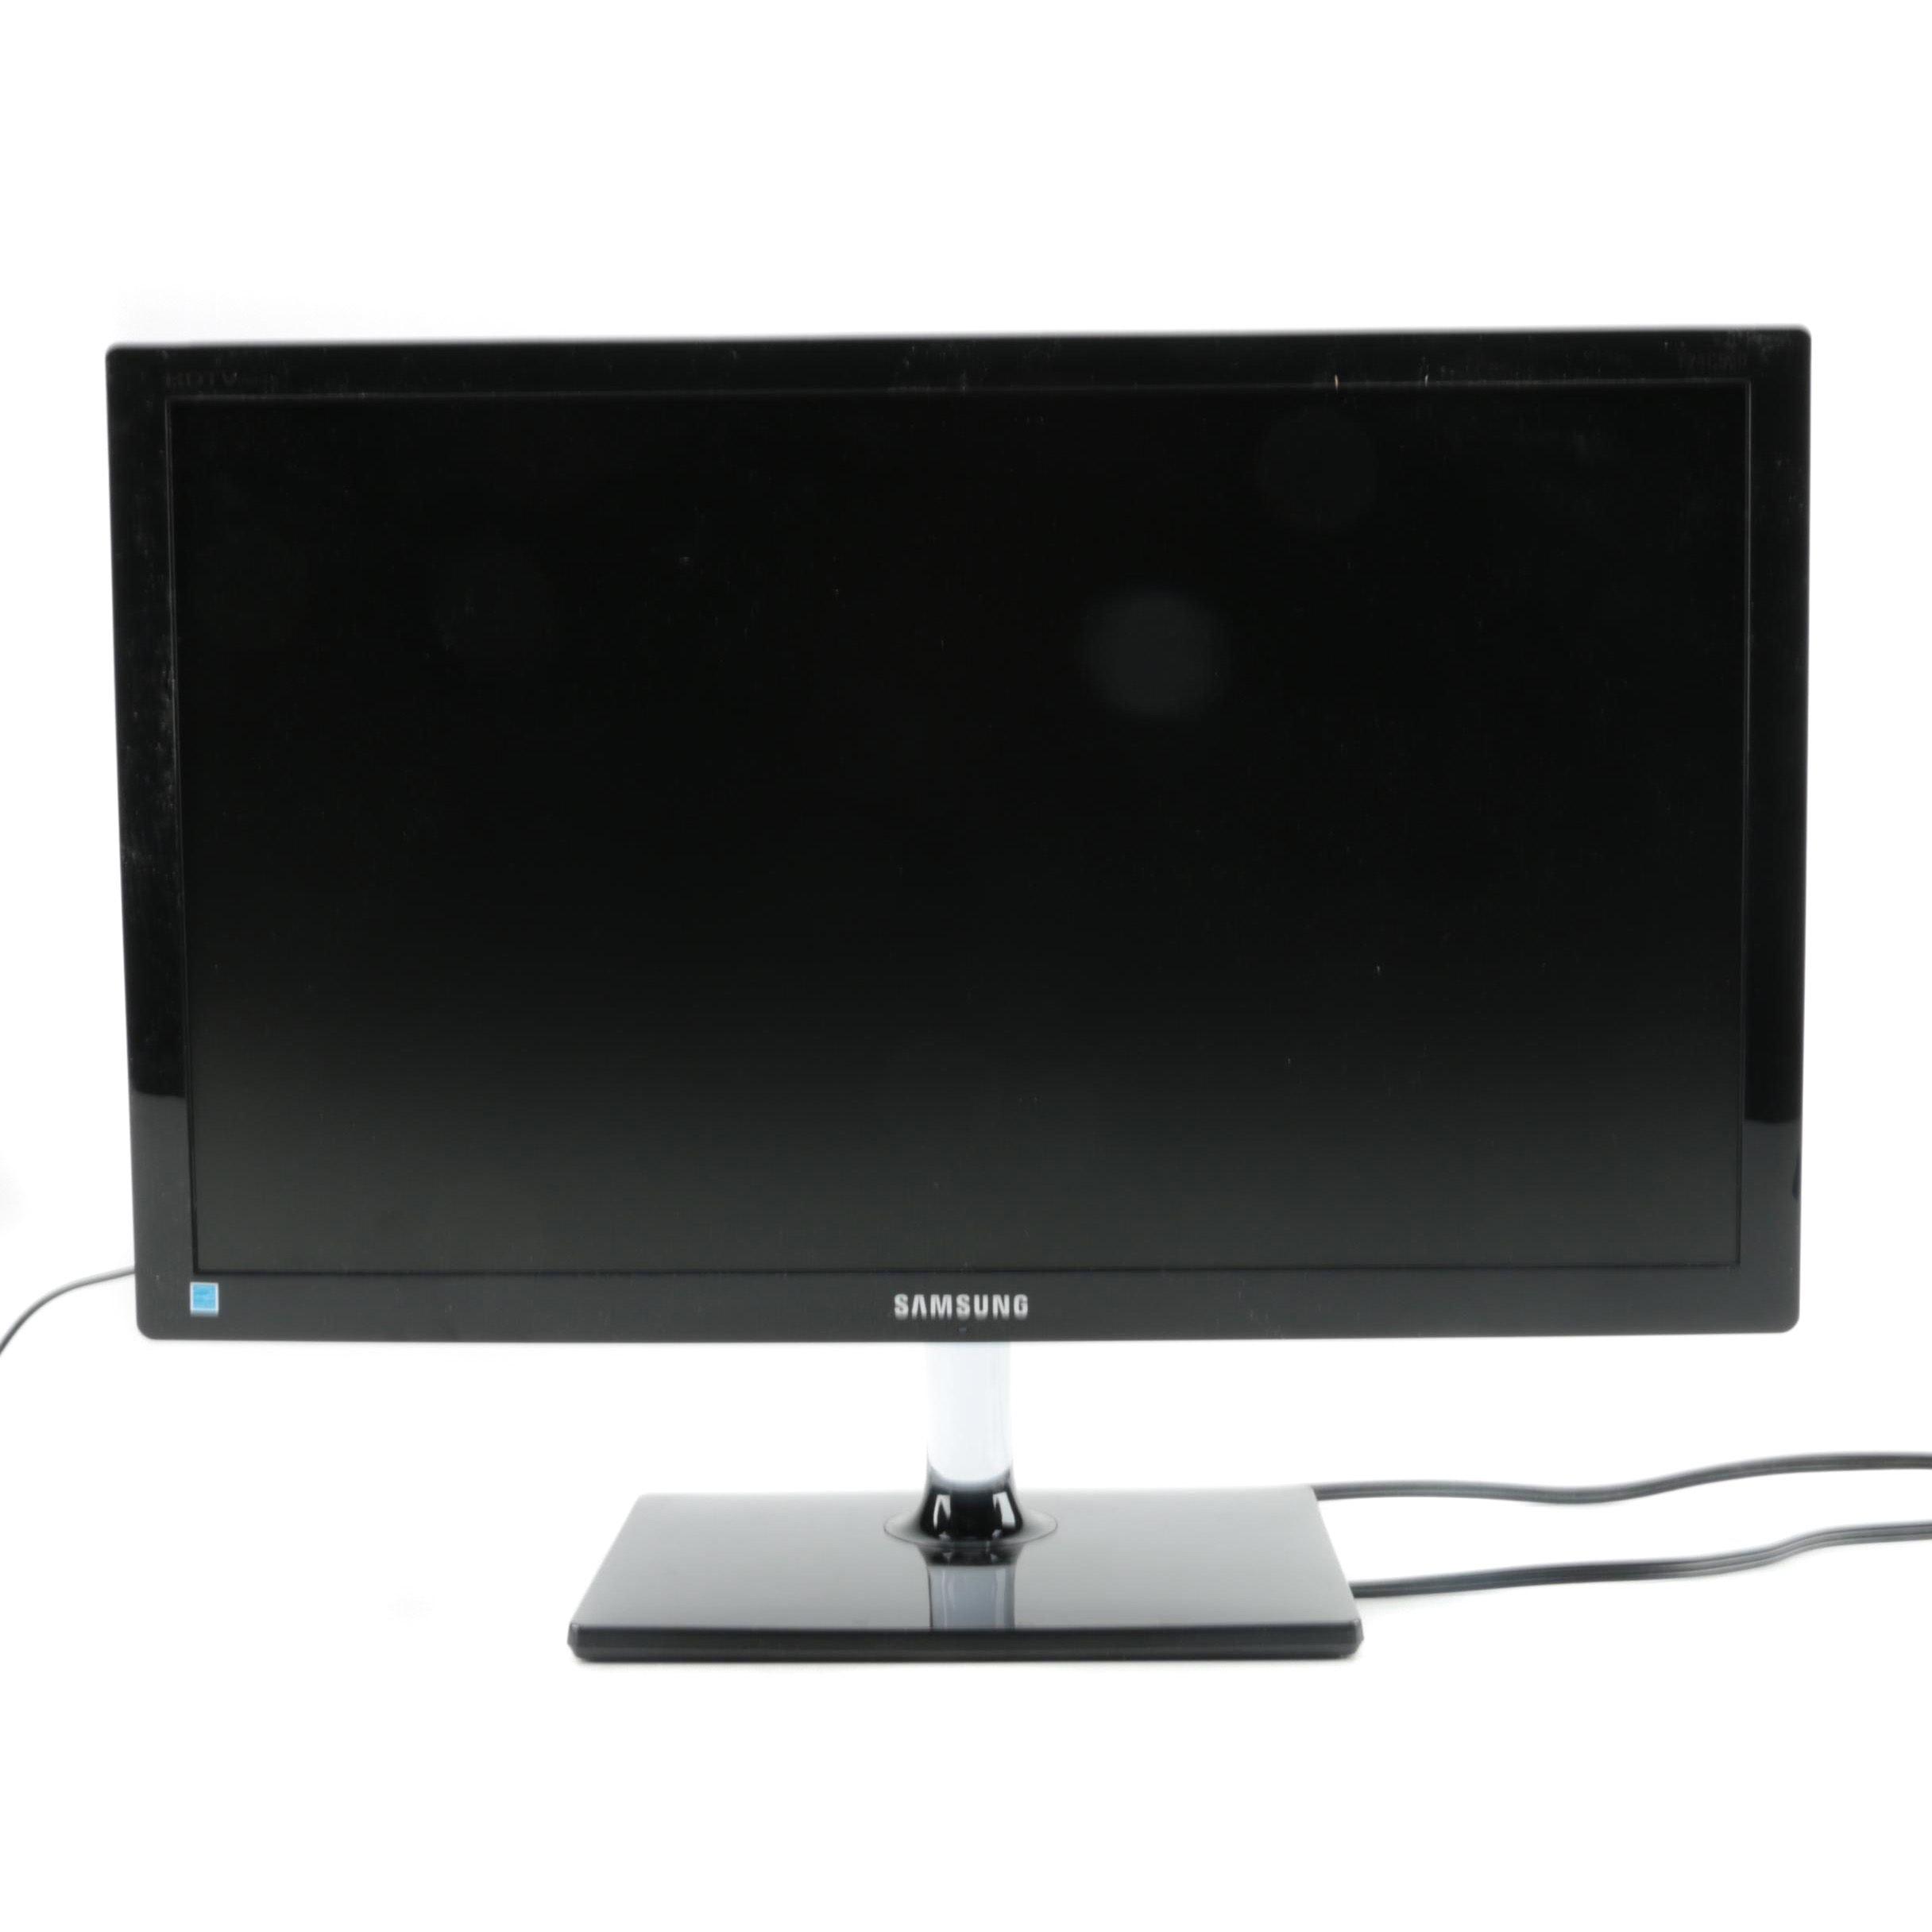 Samsung HDMI Television